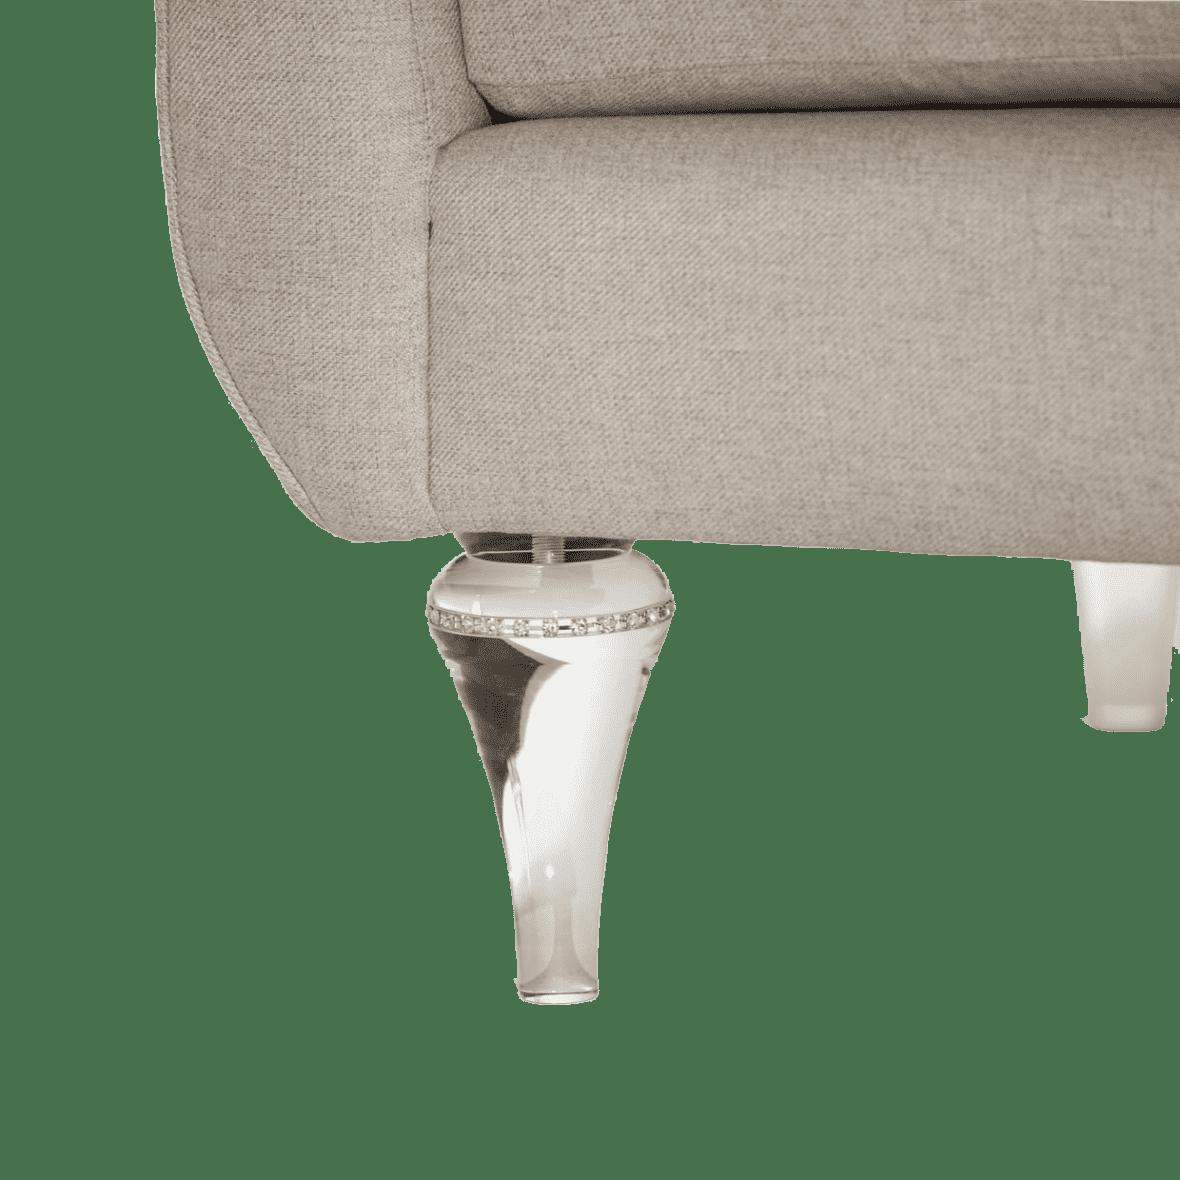 Софа Loveseat Platinum, хрустальные ножки